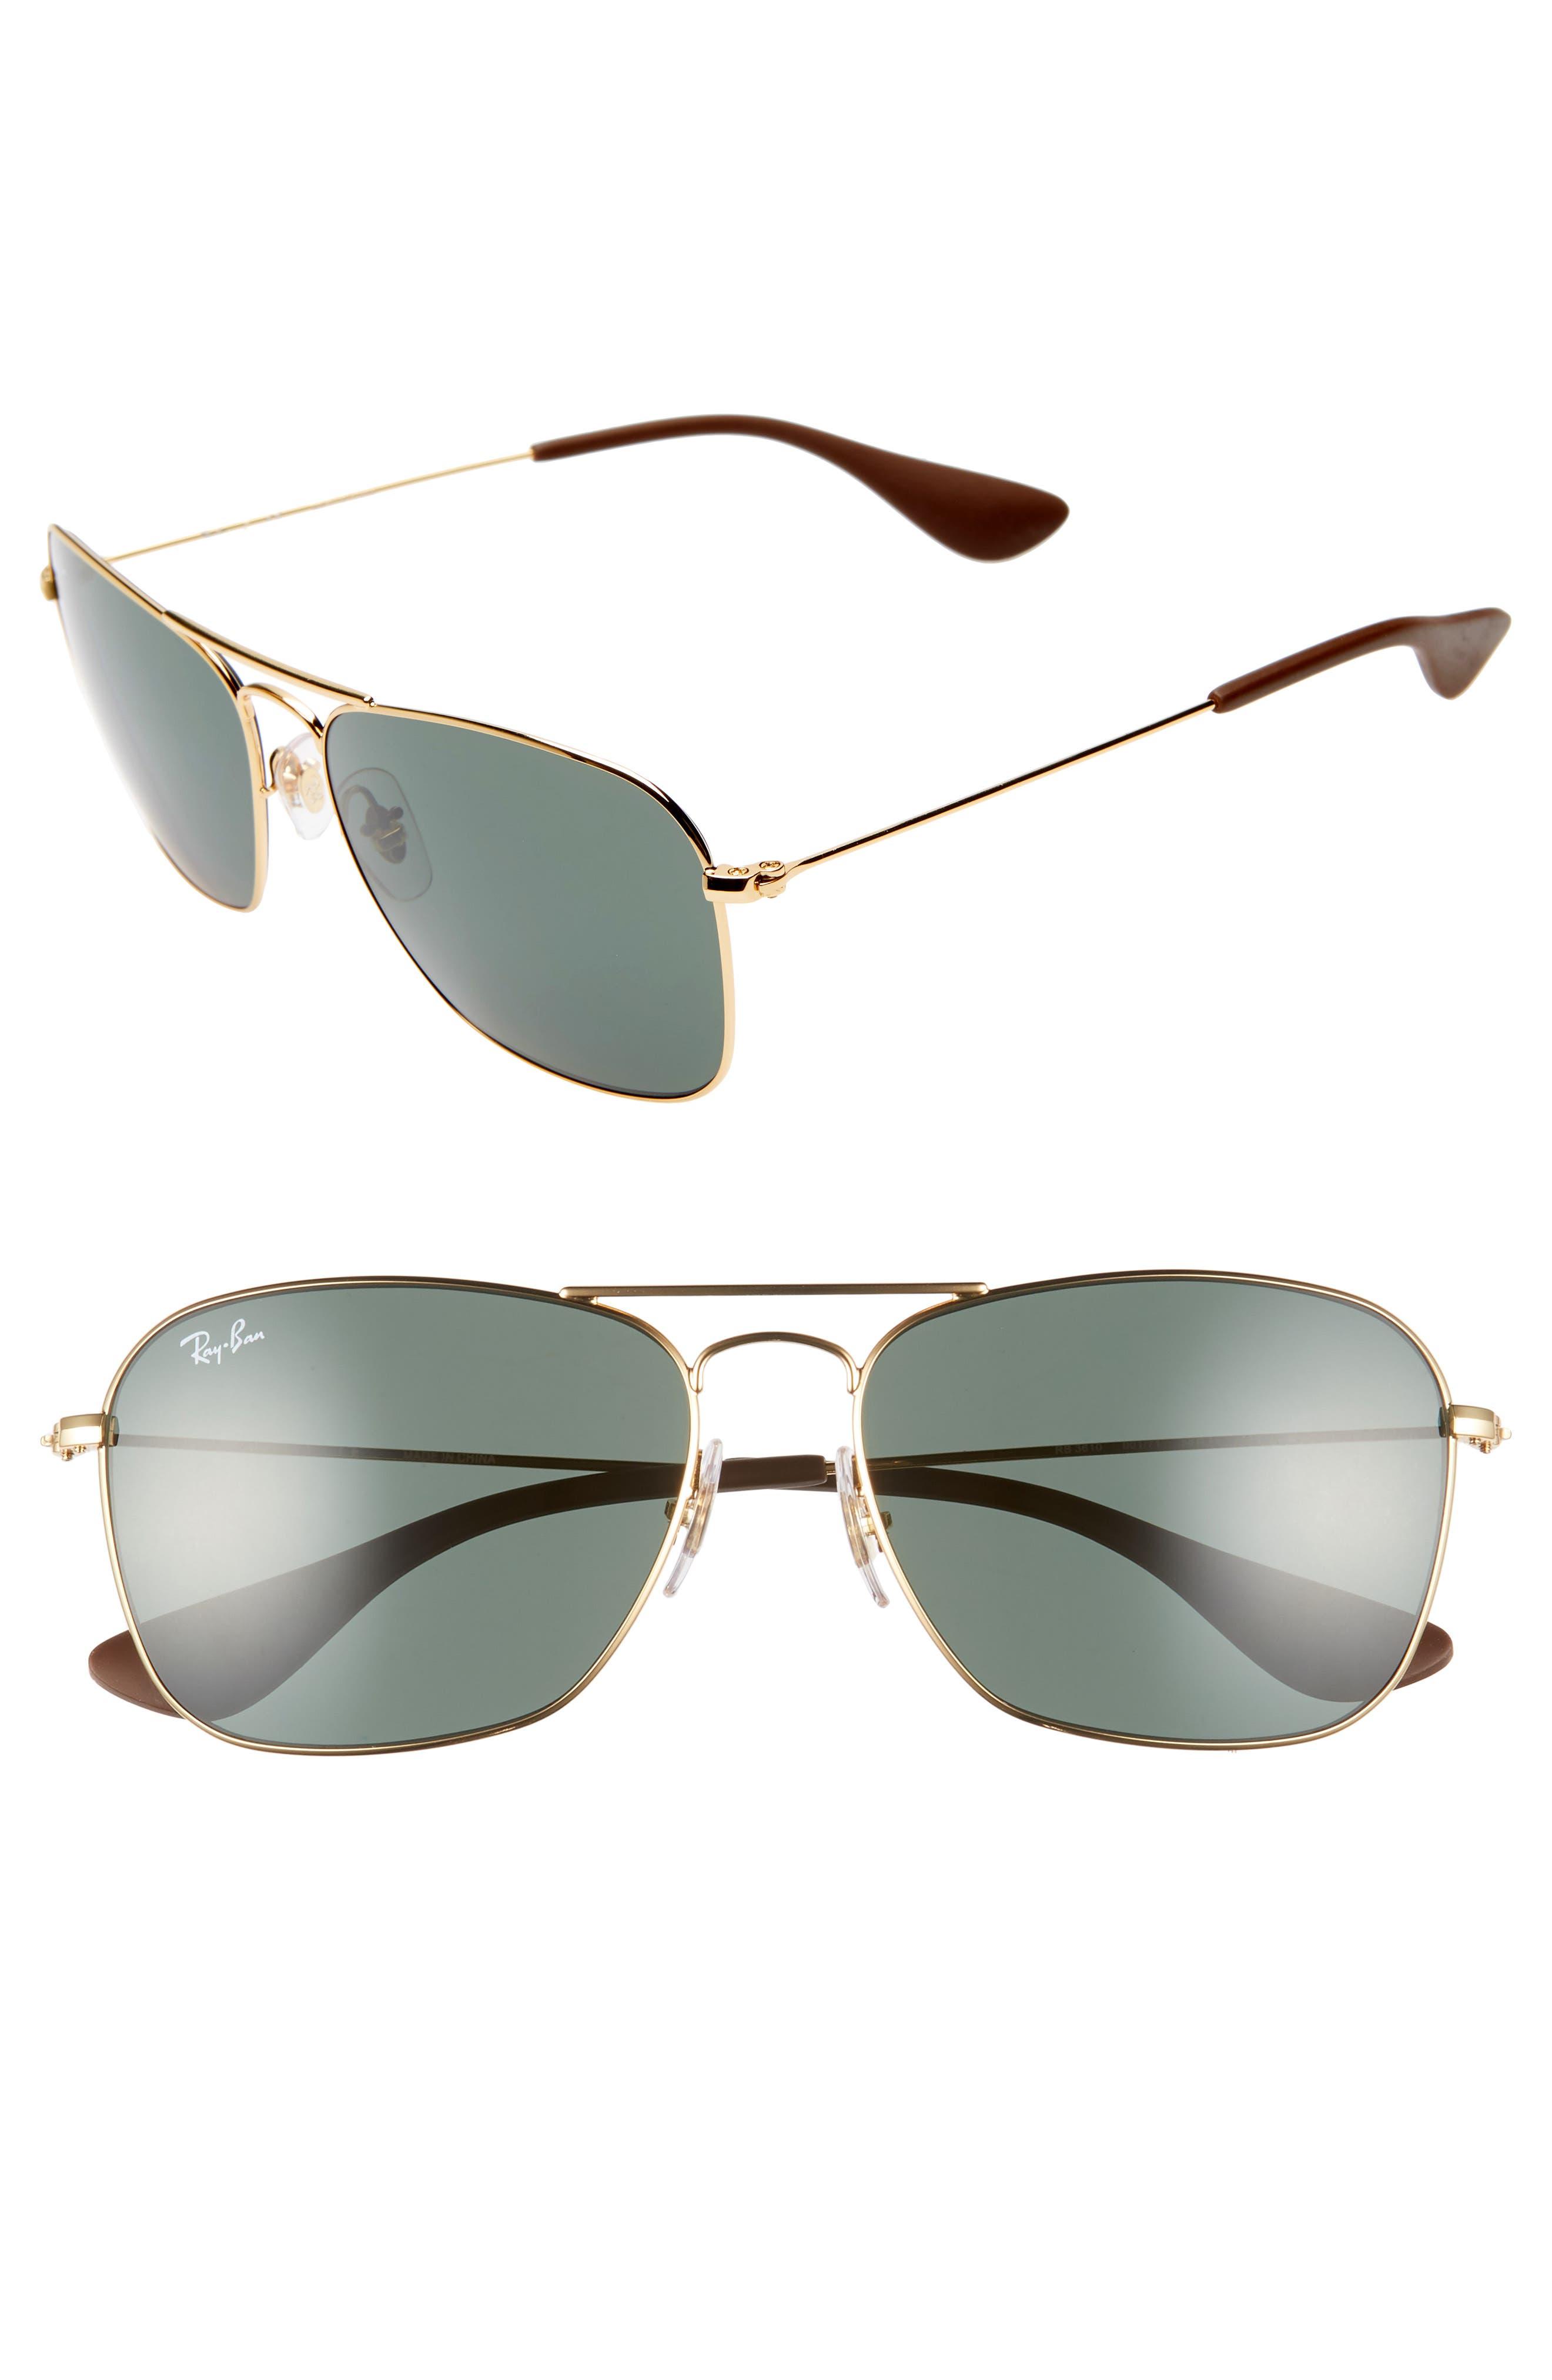 58mm Polarized Navigator Sunglasses,                             Main thumbnail 1, color,                             GOLD